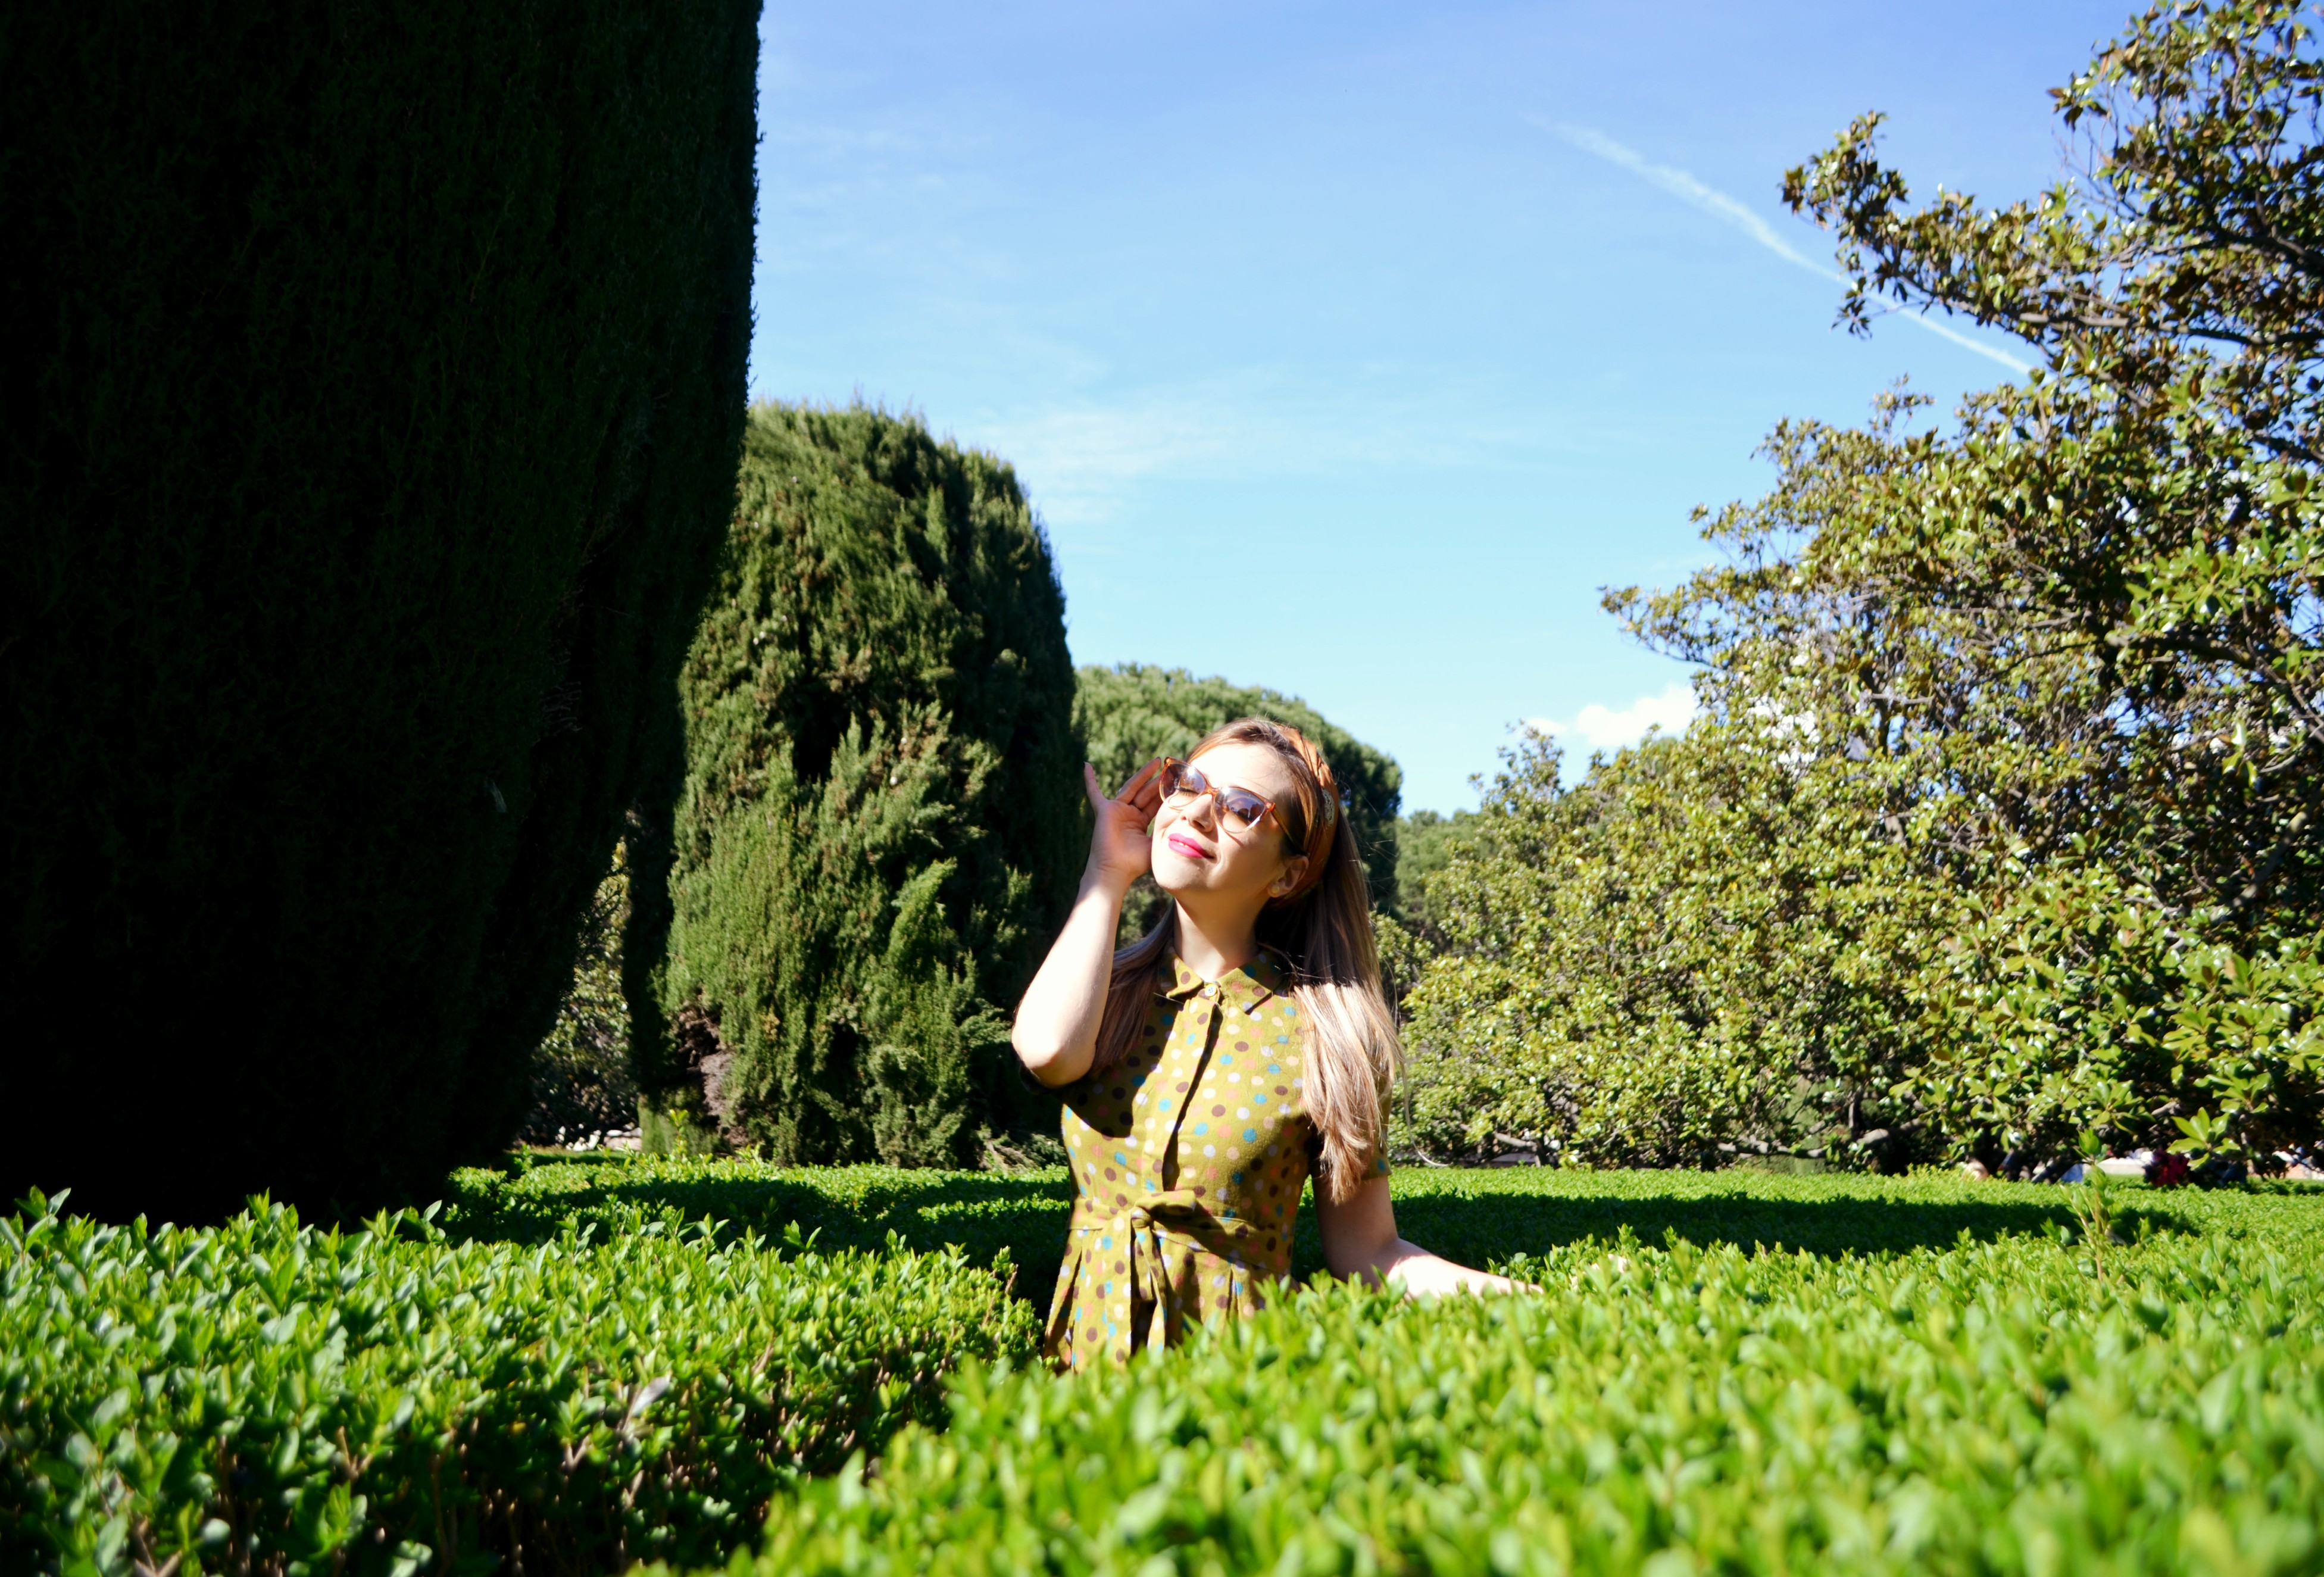 Vestido-de-lunares-Kling-blog-de-moda-ChicAdicta-fashionista-Chic-Adicta-polkadot-dress-vintage-look-influencer-Madrid-PiensaenChic-Piensa-en-Chic